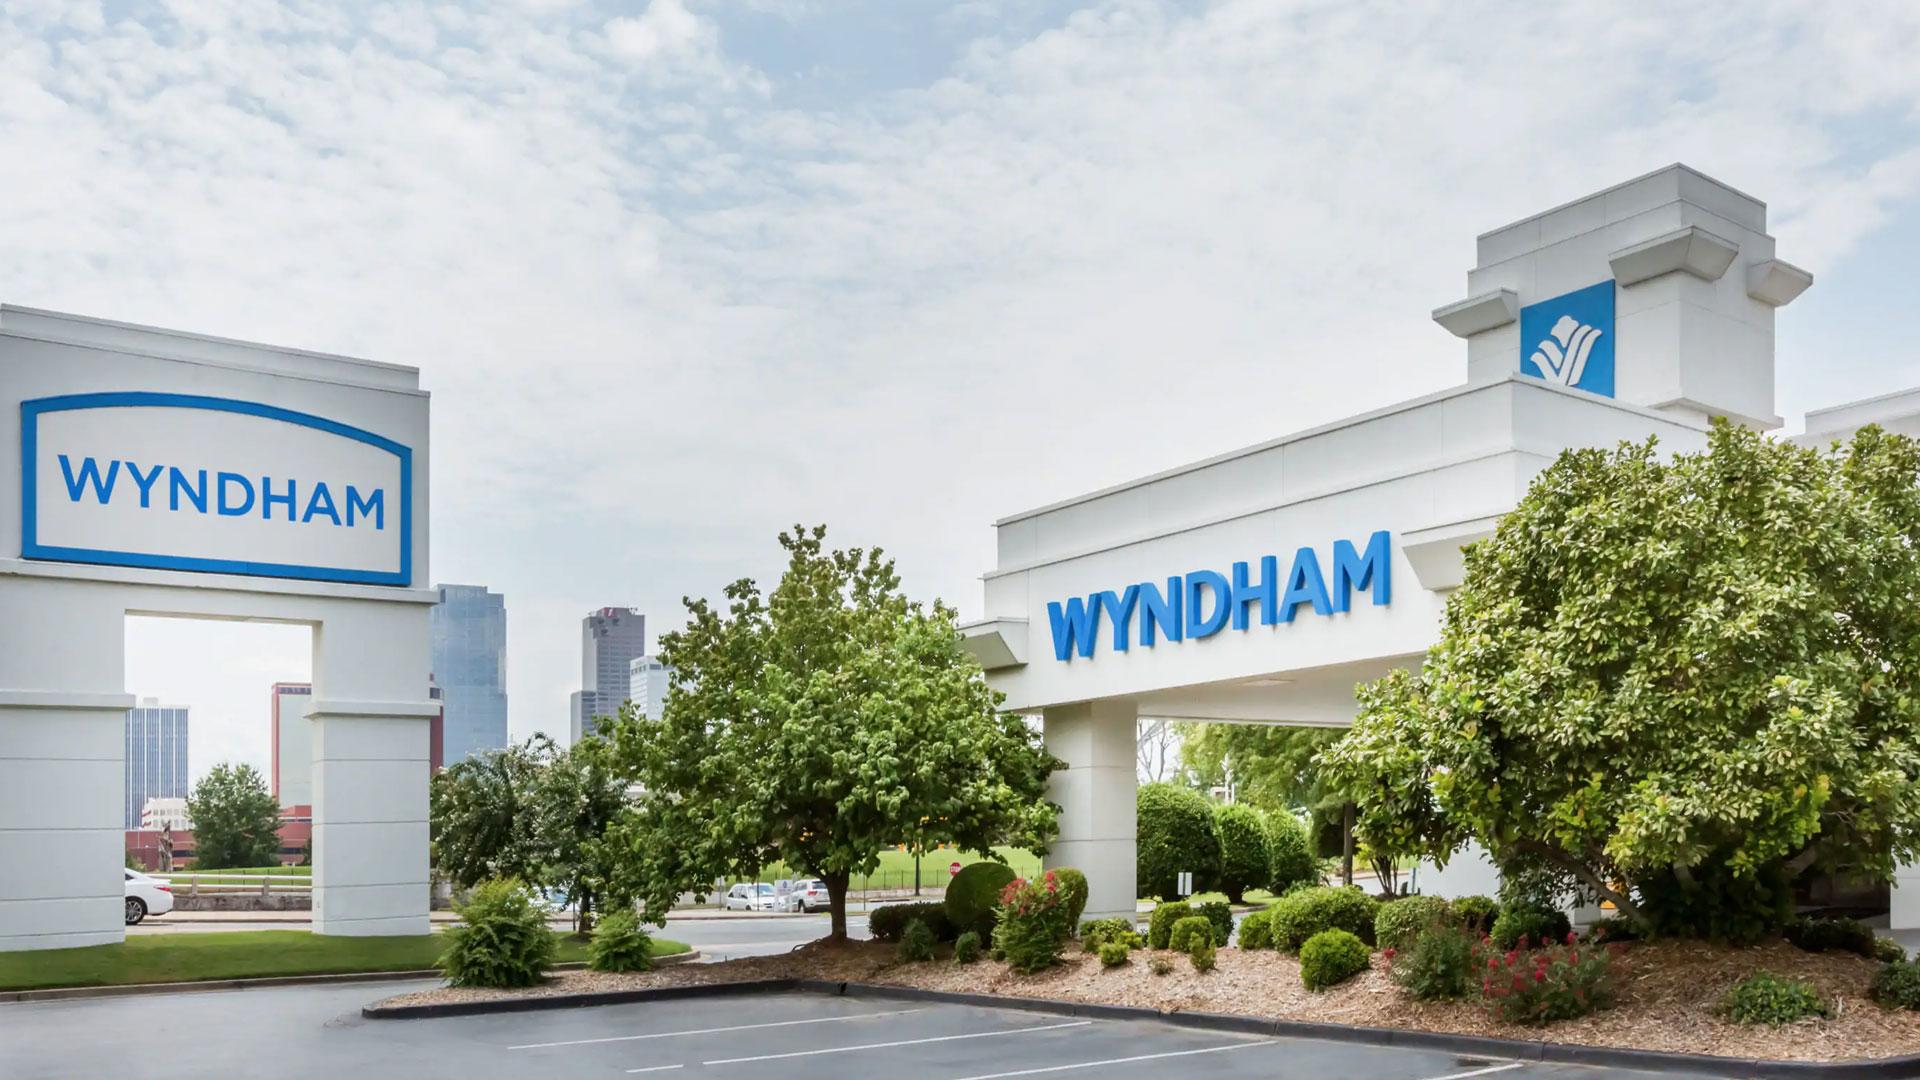 Image of Wyndham hotel in North Little Rock, Arkansas